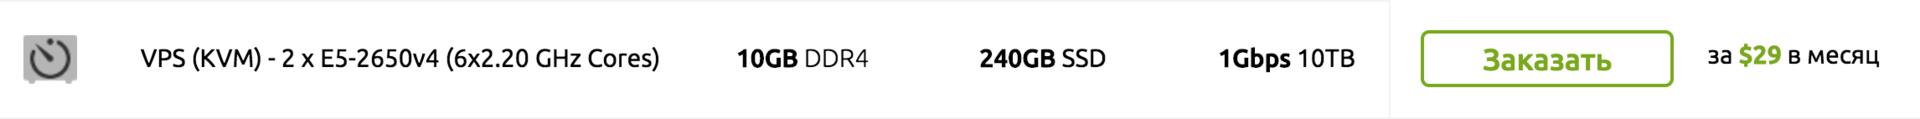 Серверы в Нидерландах для Хабра бесплатно на декабрь: E5-2650 v4 (6 Cores) 10GB DDR4 240GB SSD 1Gbps 10TB — $29 - месяц - 3